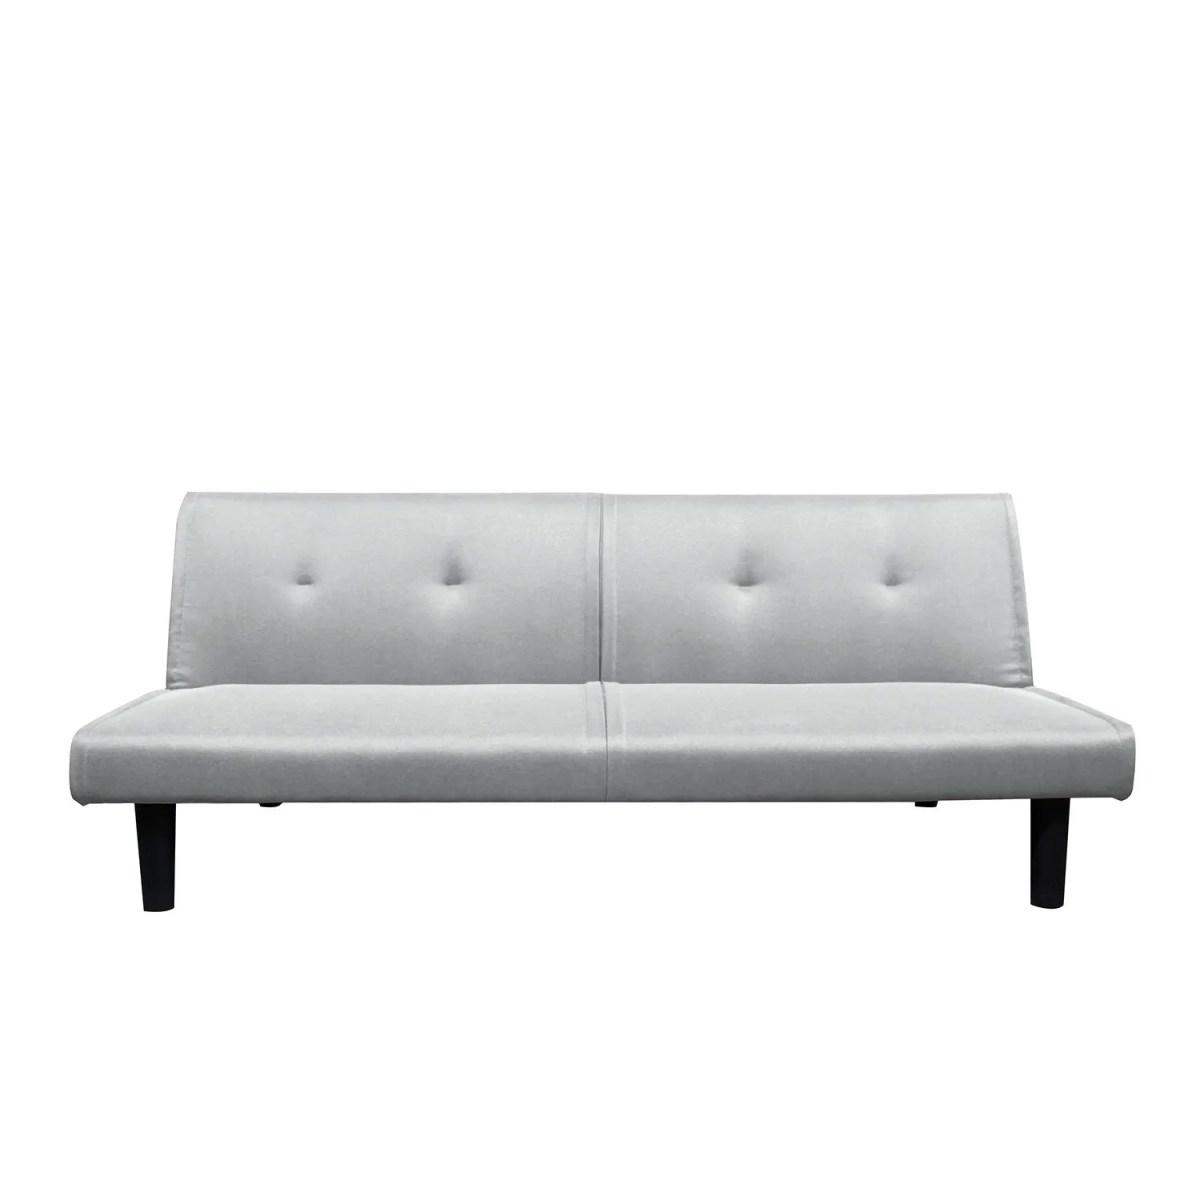 sofacama reclinable futon individual bossa erik 4